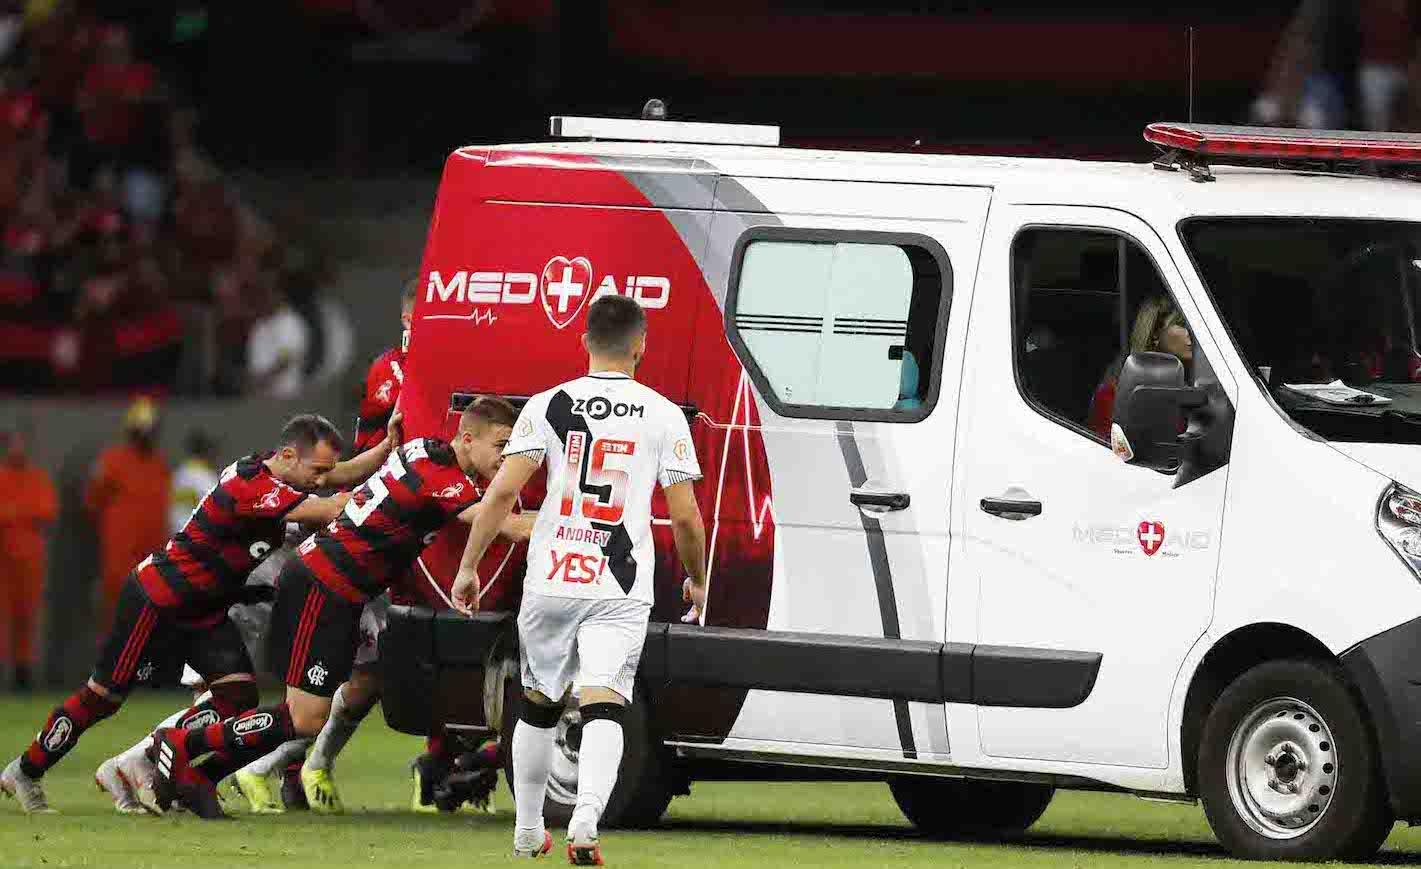 Brasília (DF) - 15/09/2018 - Vasco RJ  X Flamengo - RJ